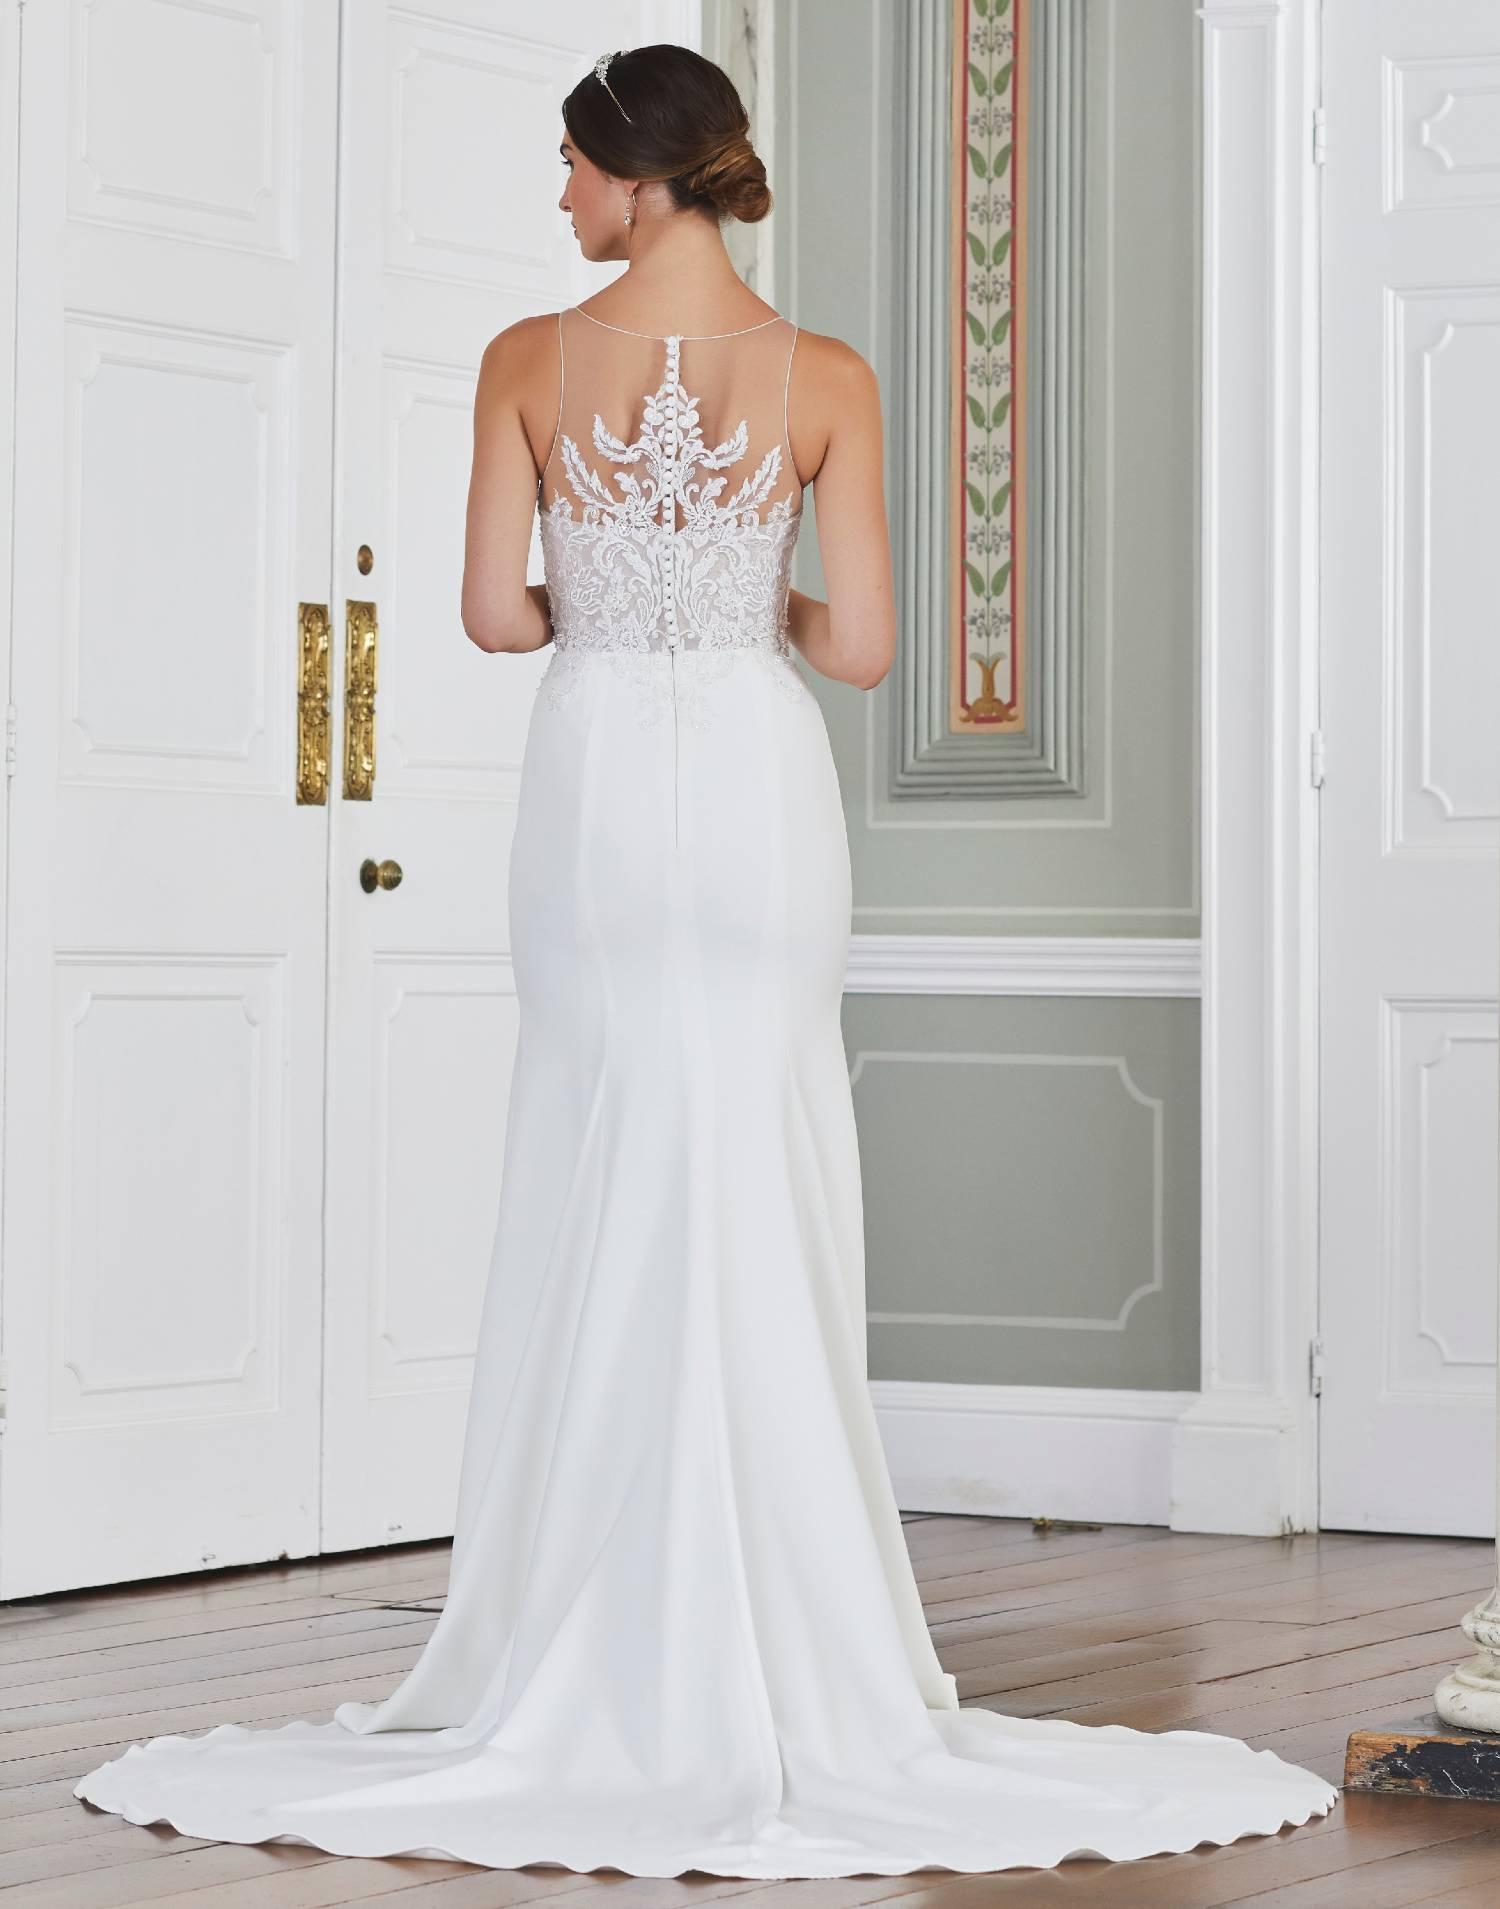 ZAMORA – Tiffanys Wedding Dress Collection – Front View